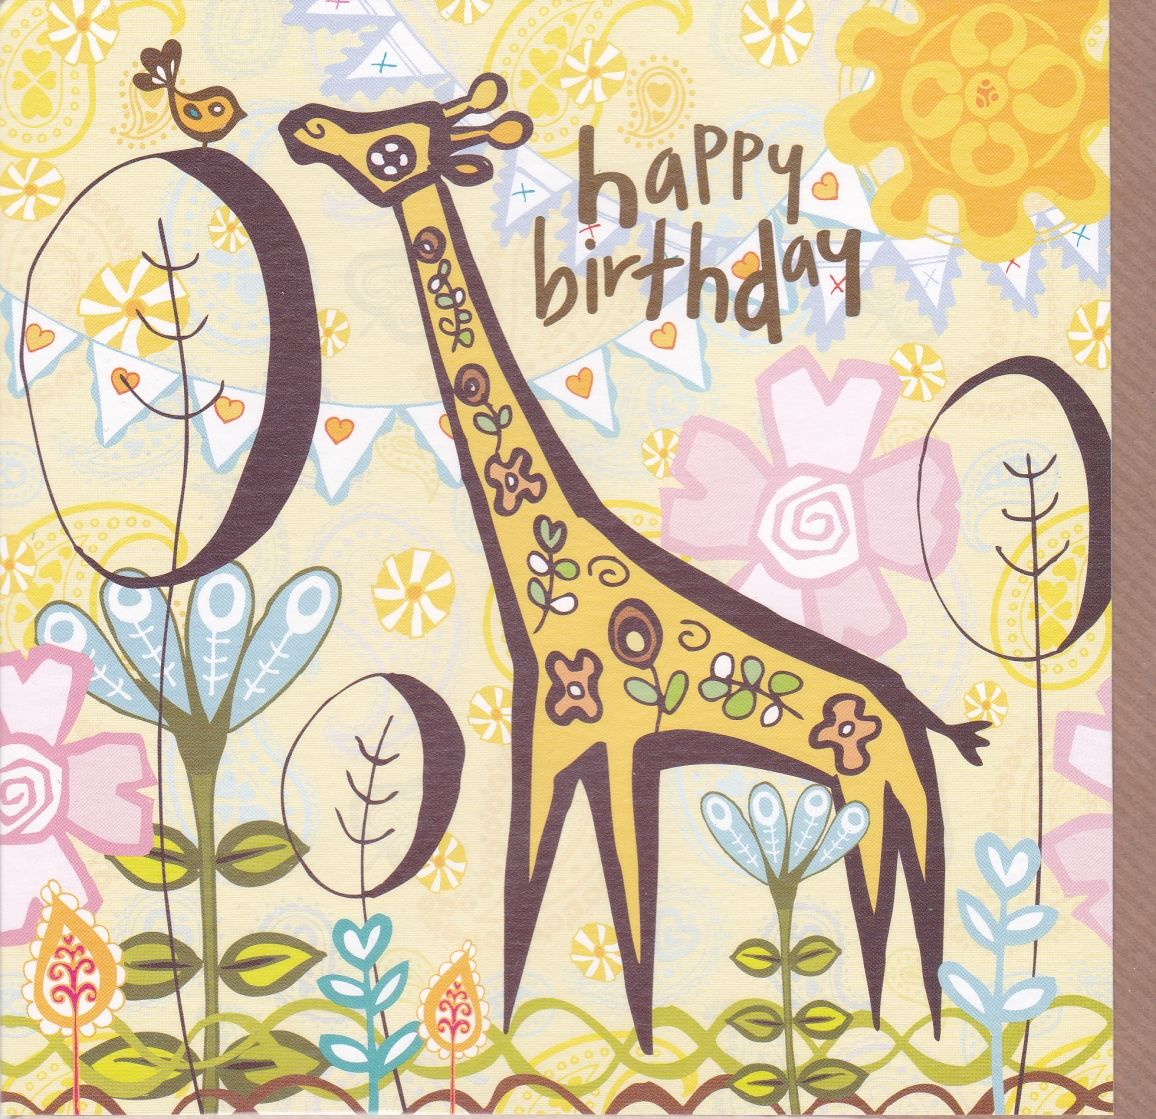 Giraffe Birthday Card Karenza Paperie